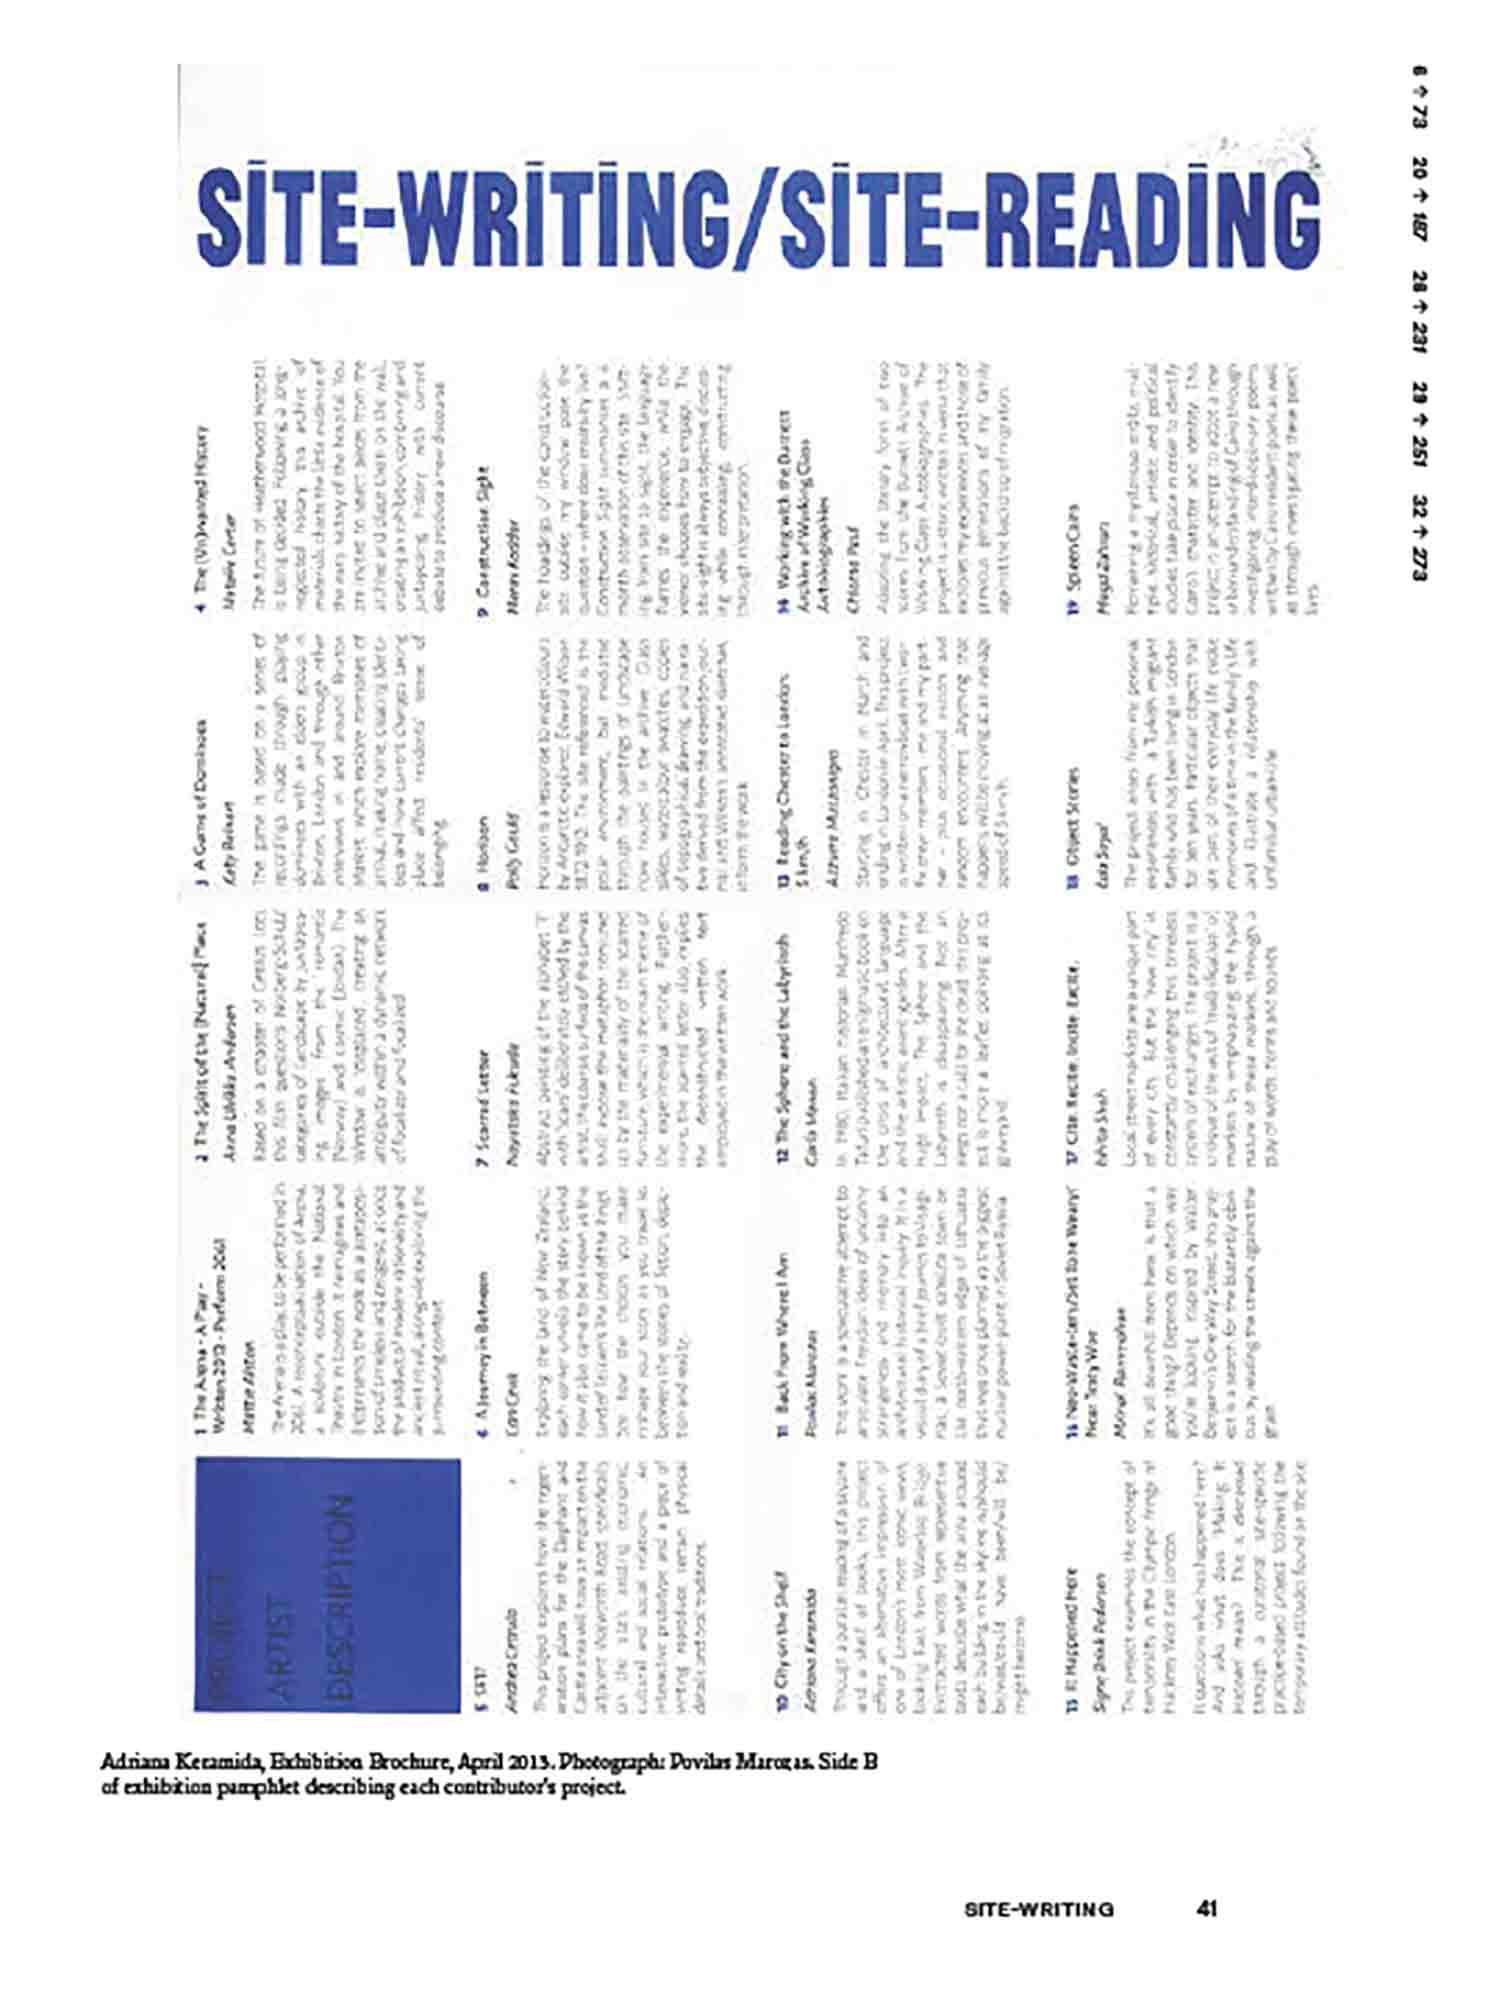 Site-Writing/Site Reading, Engaged Urbanism (41)